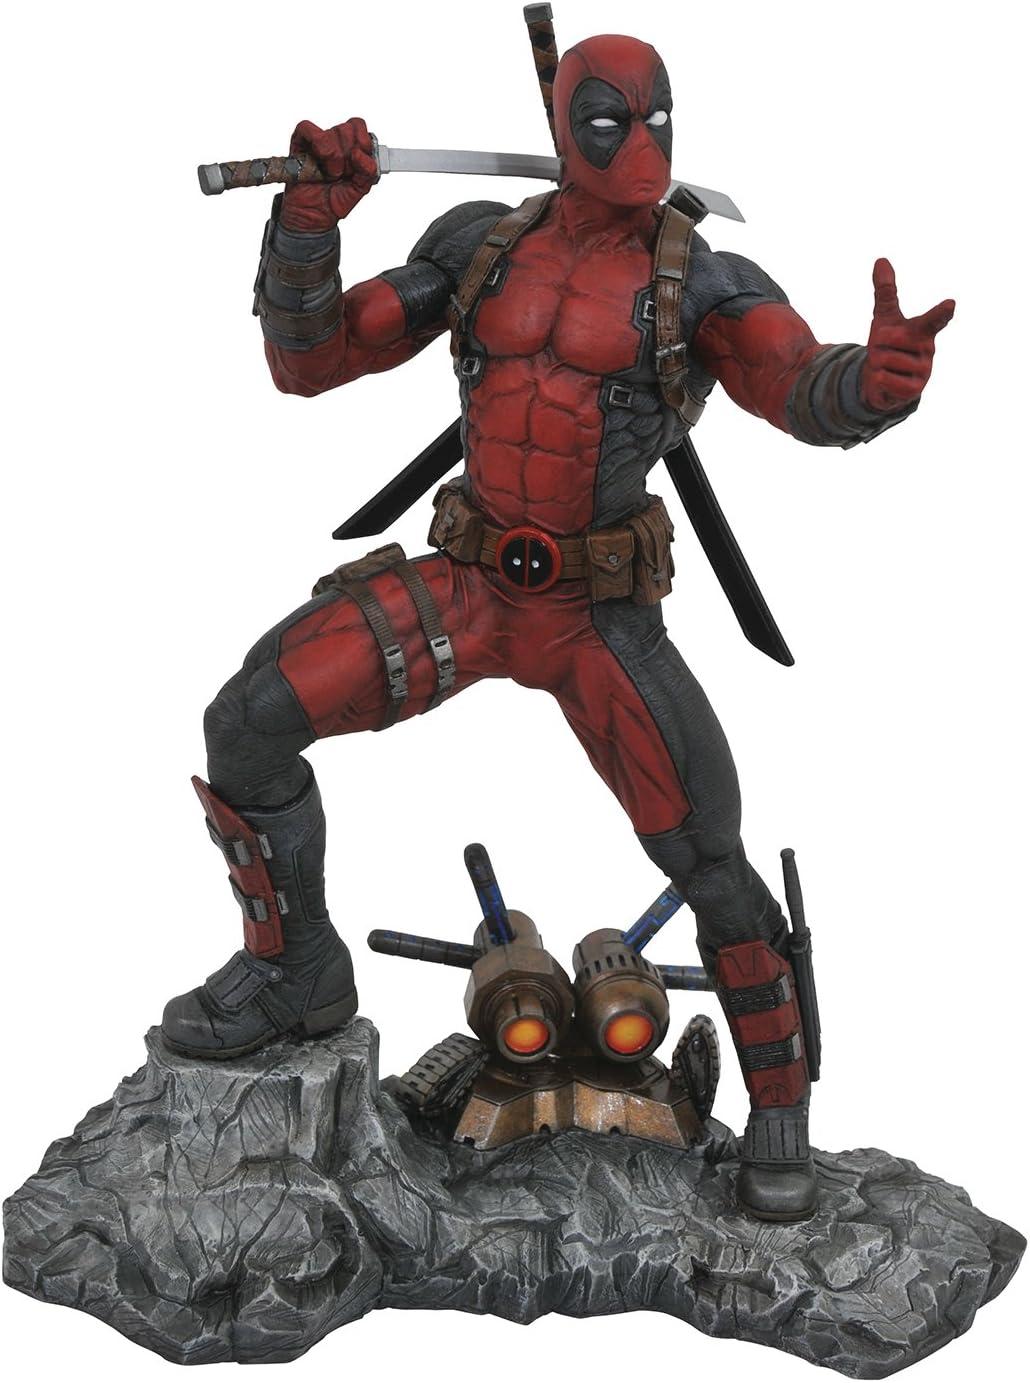 Marvel Select Deadpool Action Figure Statue Figurines Collectors Edition